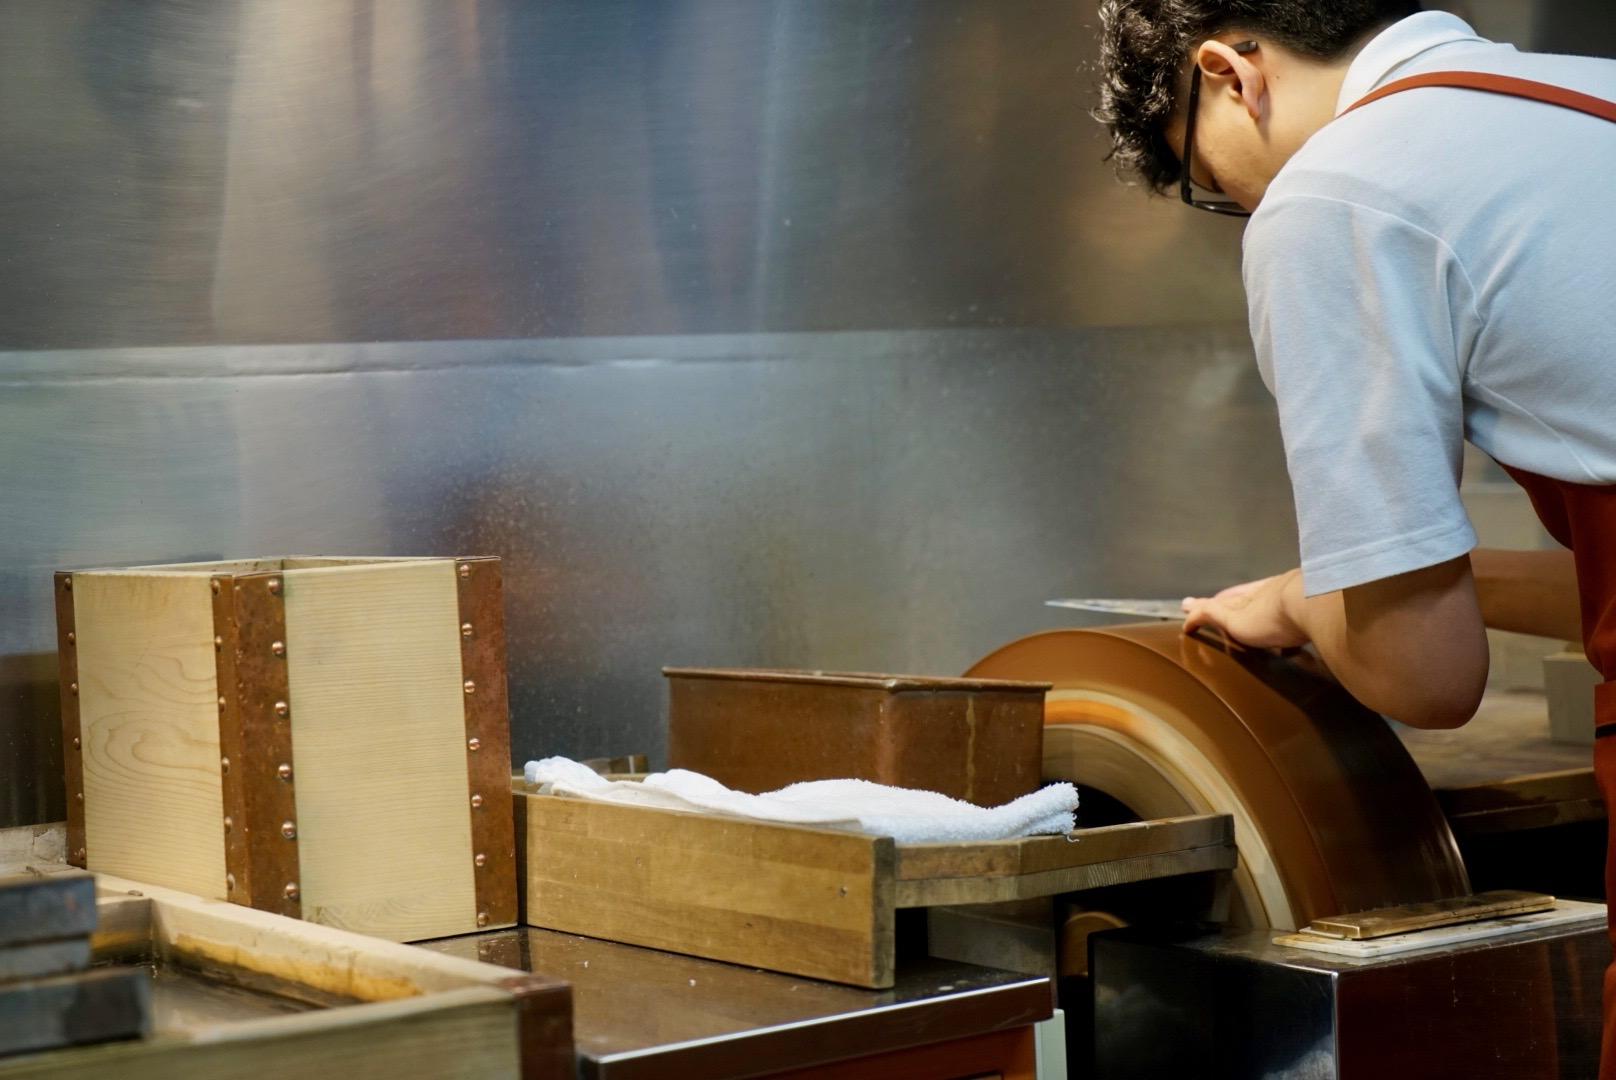 aritsugu knives  - it is  so  sharp.